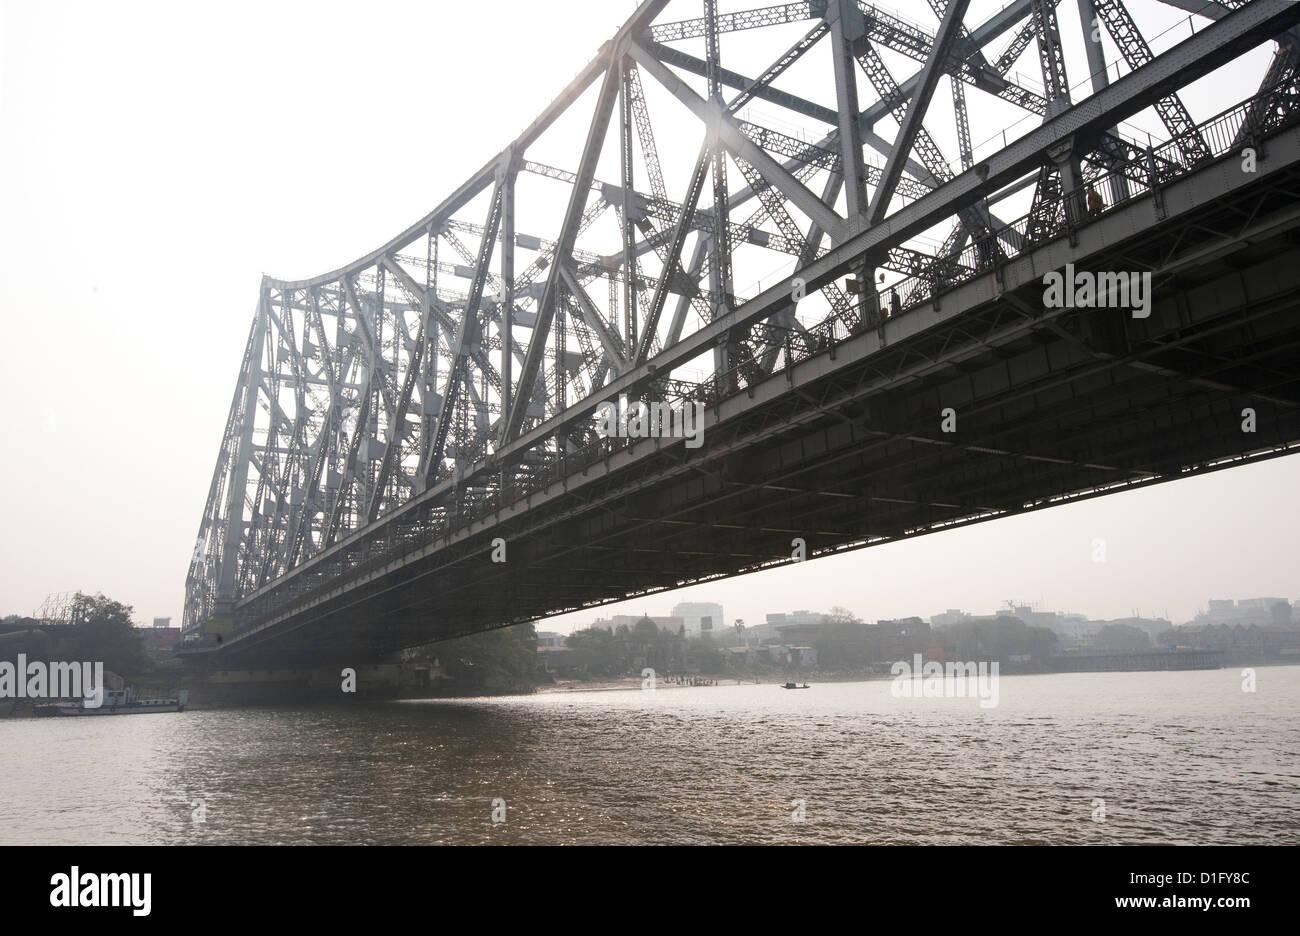 Howrah Bridge from the River Hugli (River Hooghly), Kolkata (Calcutta), West Bengal, India, Asia - Stock Image